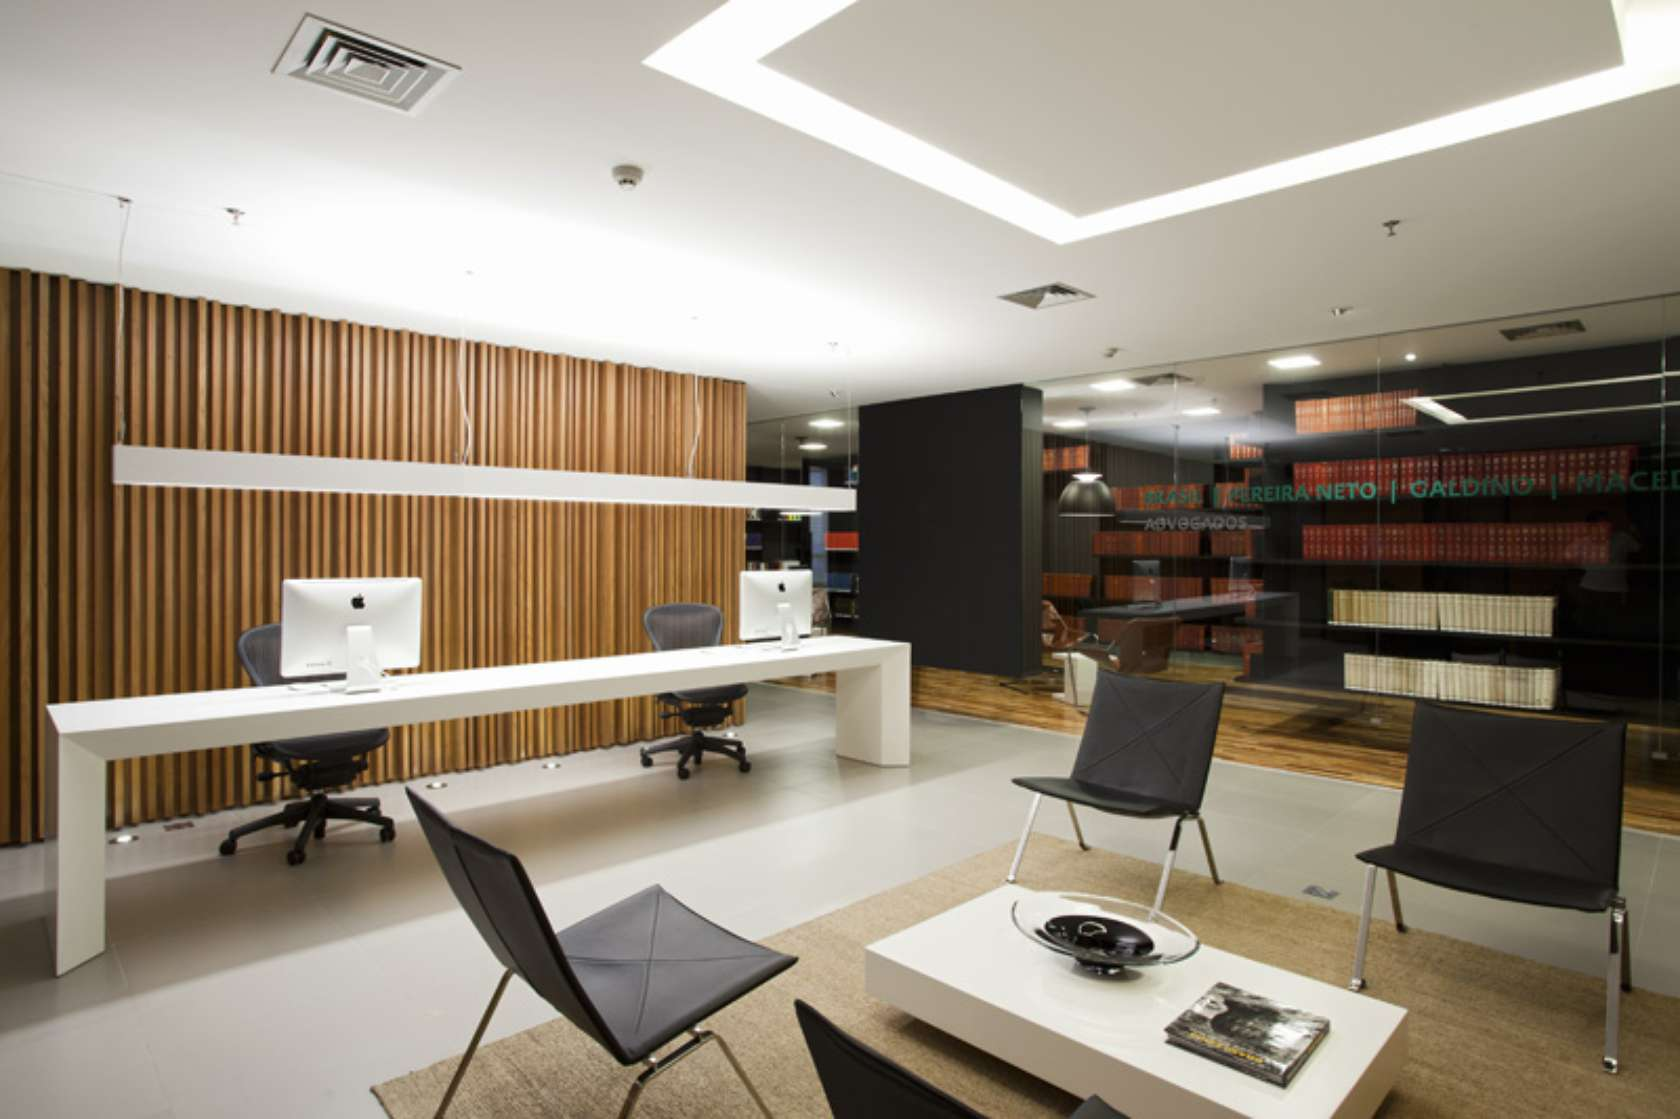 bpgm law firm on architizer bpgm law office